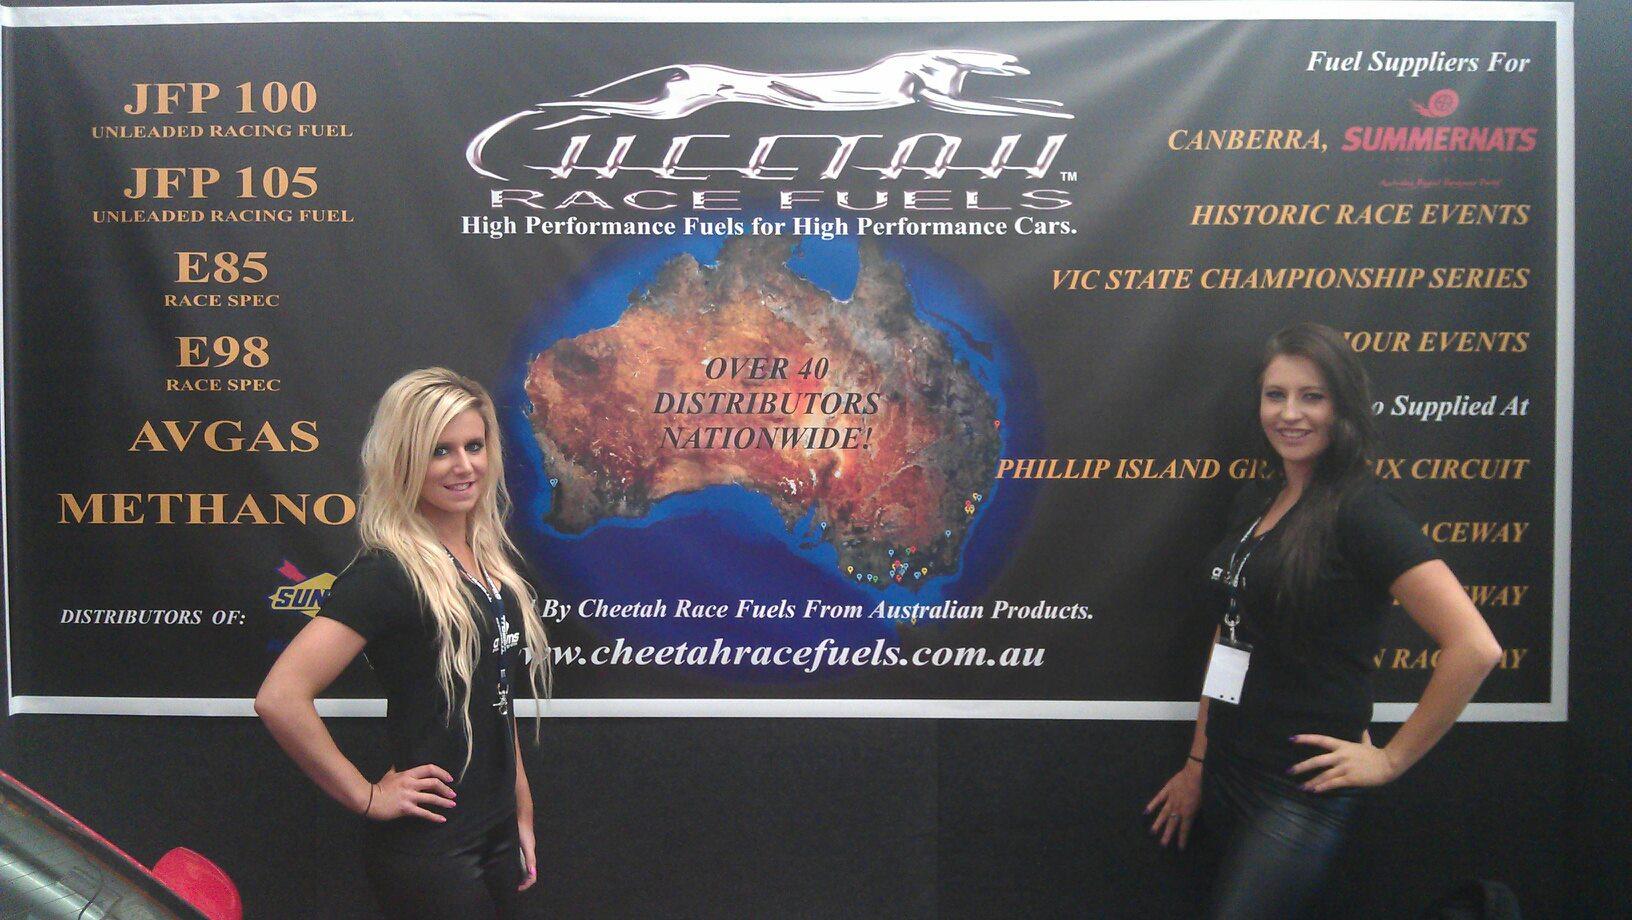 Cheetah Race Fuels